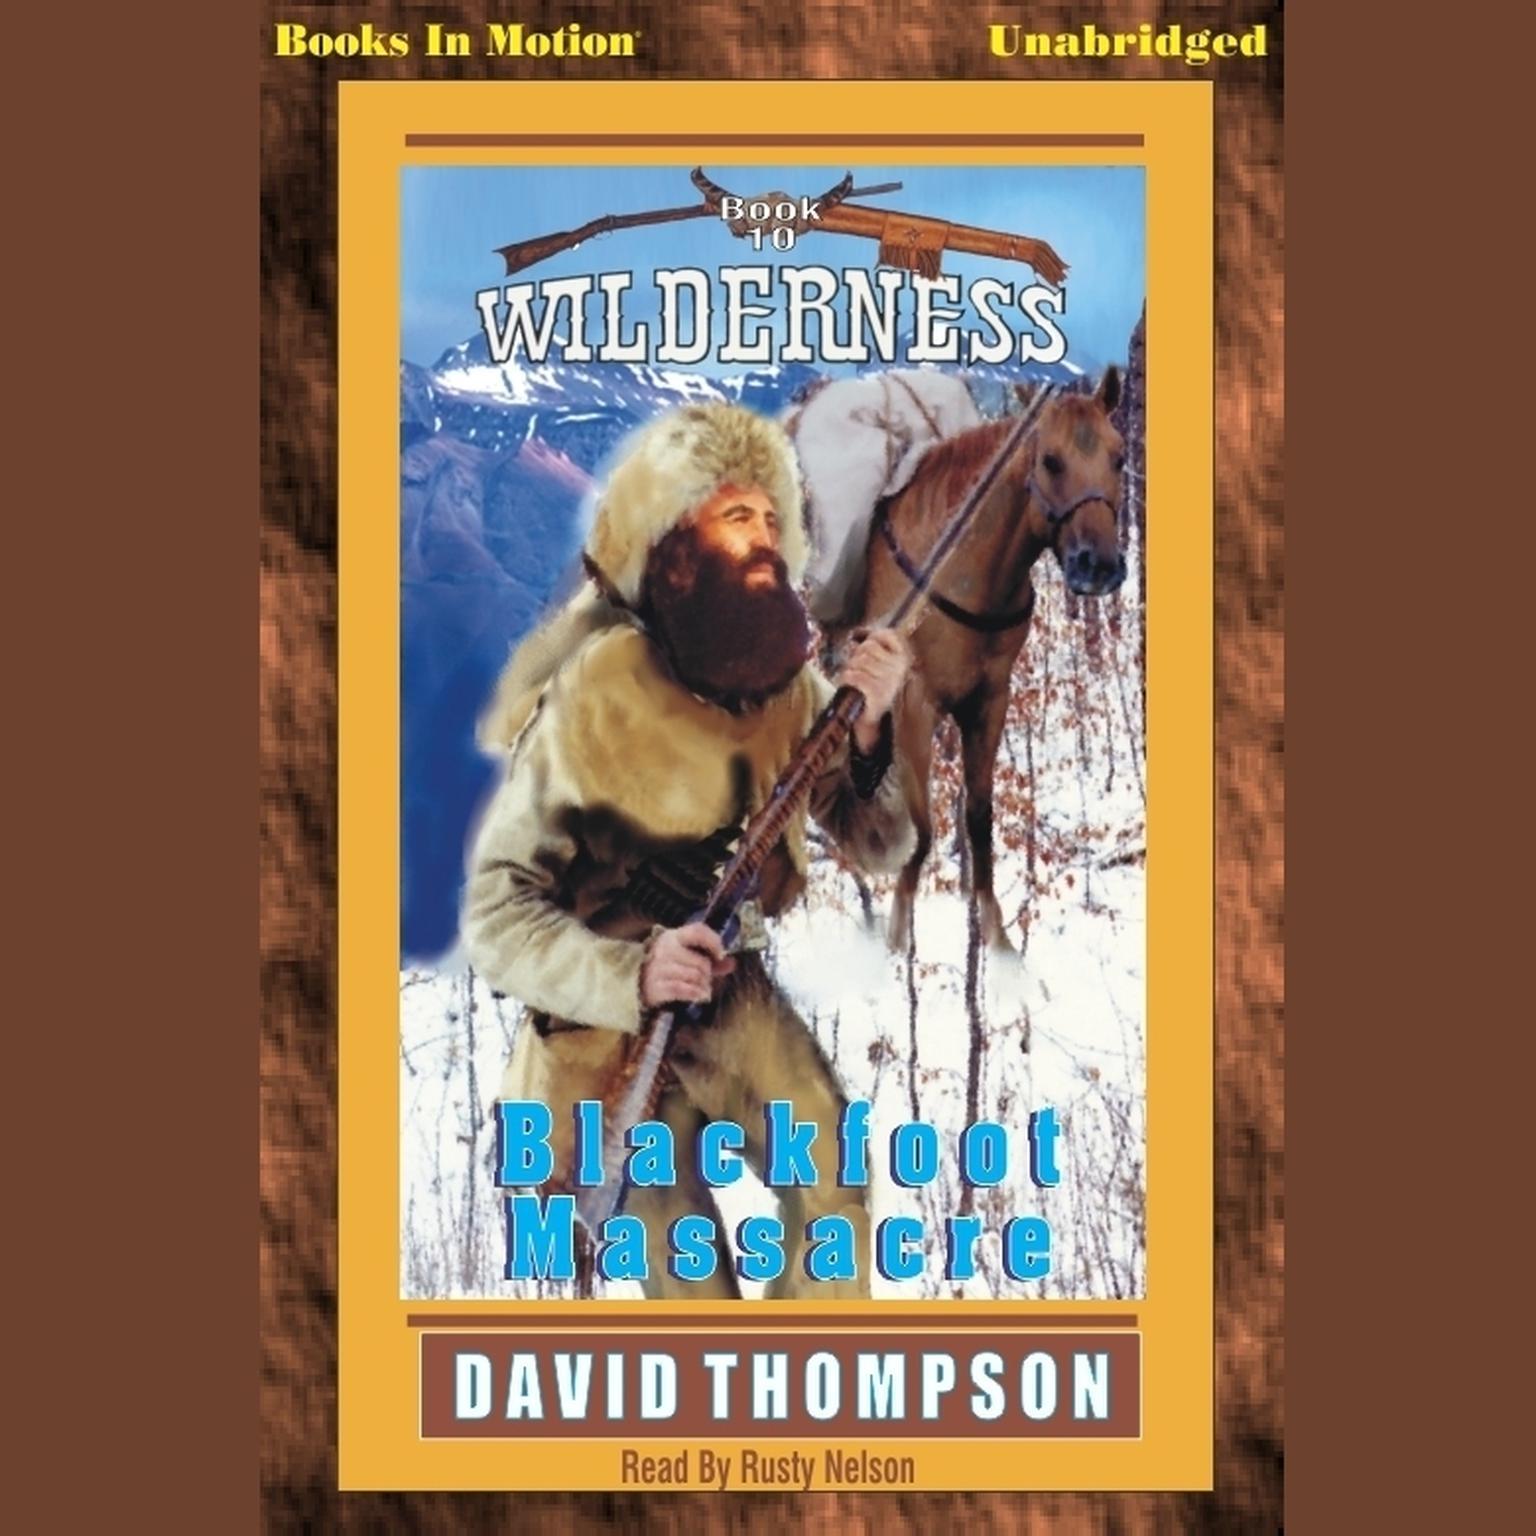 Blackfoot Massacre Audiobook, by David Thompson